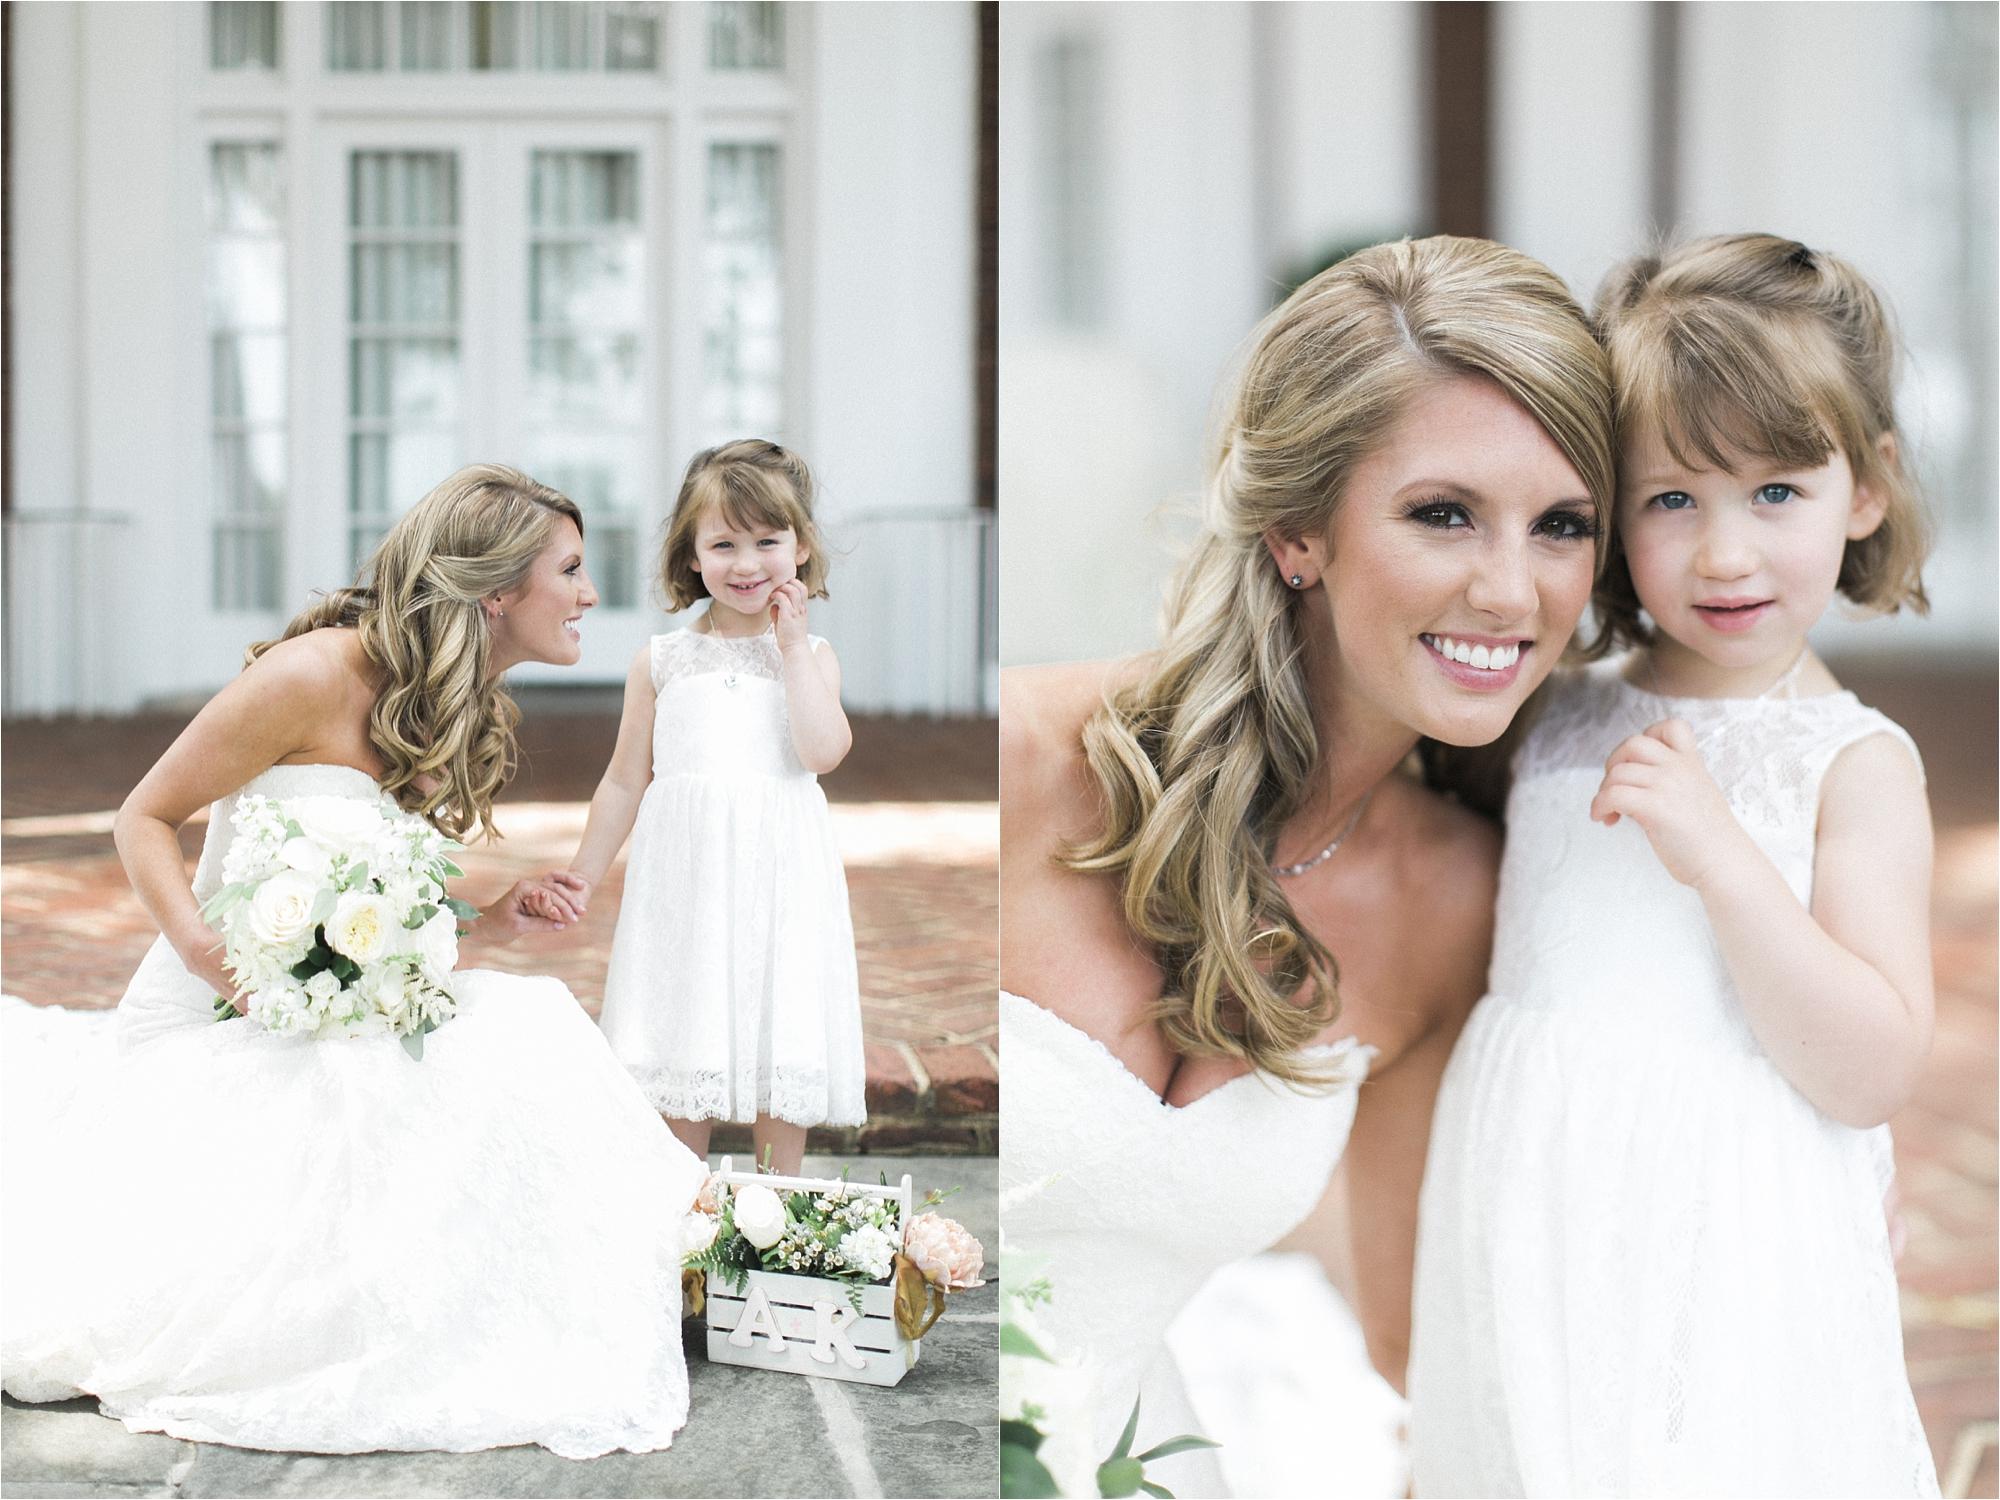 stephanie-yonce-photography-richmond-virginia-country-club-wedding_0028.jpg